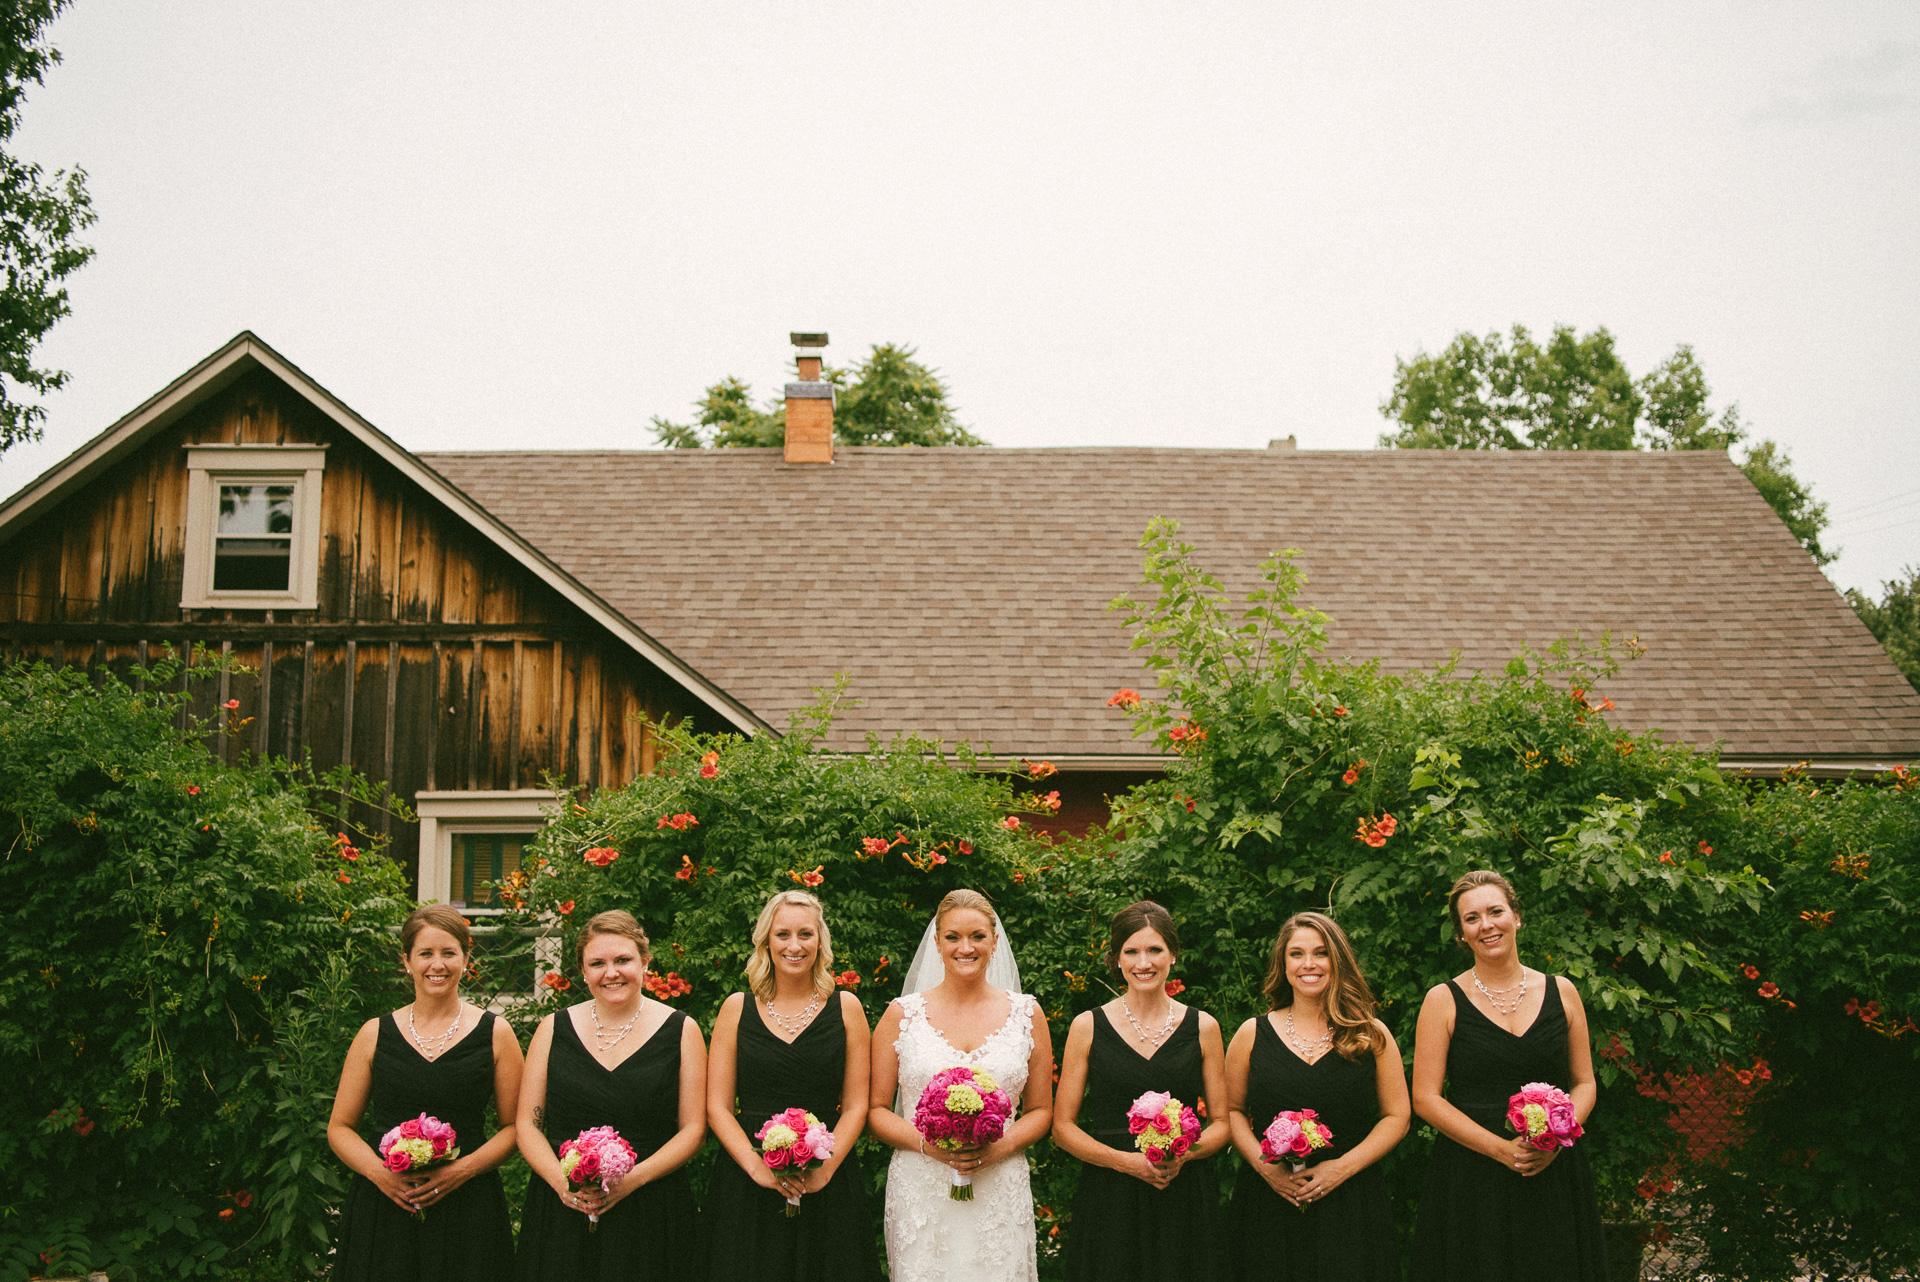 Dayton Wedding Photographer - Bridesmaides